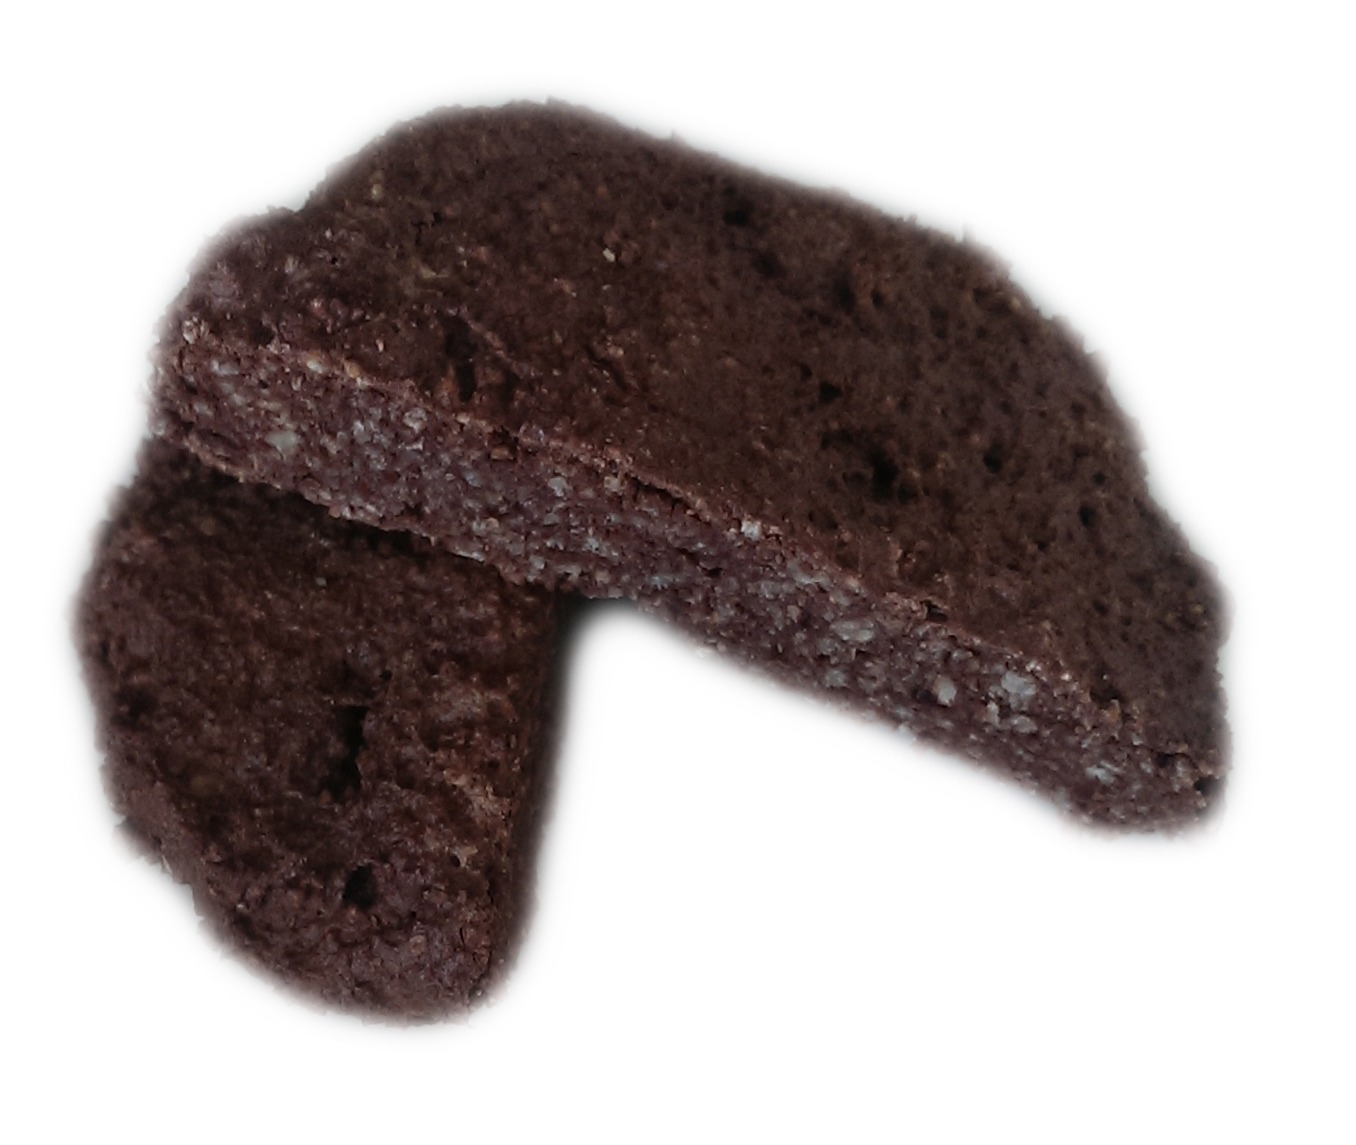 Schoko-Cookie mit Mandelmehl